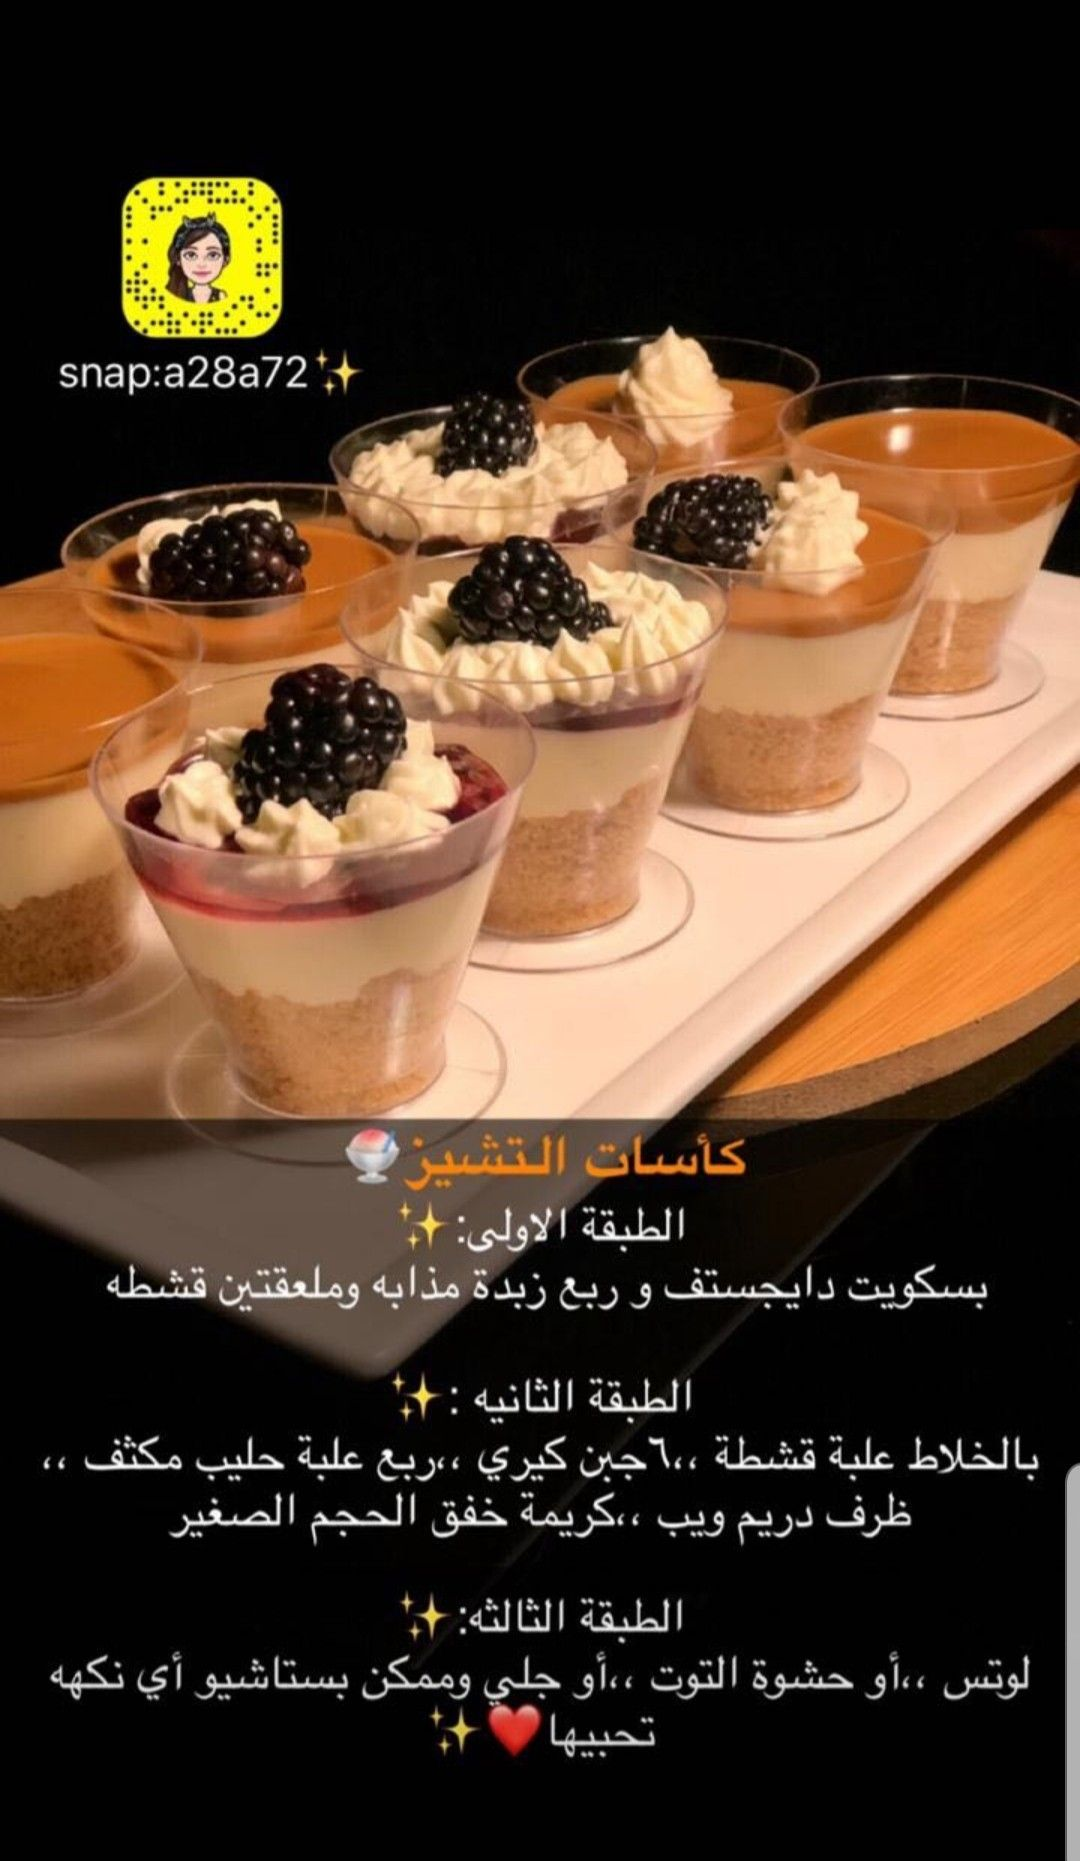 Pin By Haidy On Food طبخ Food Drinks Dessert Yummy Food Dessert Cooking Recipes Desserts